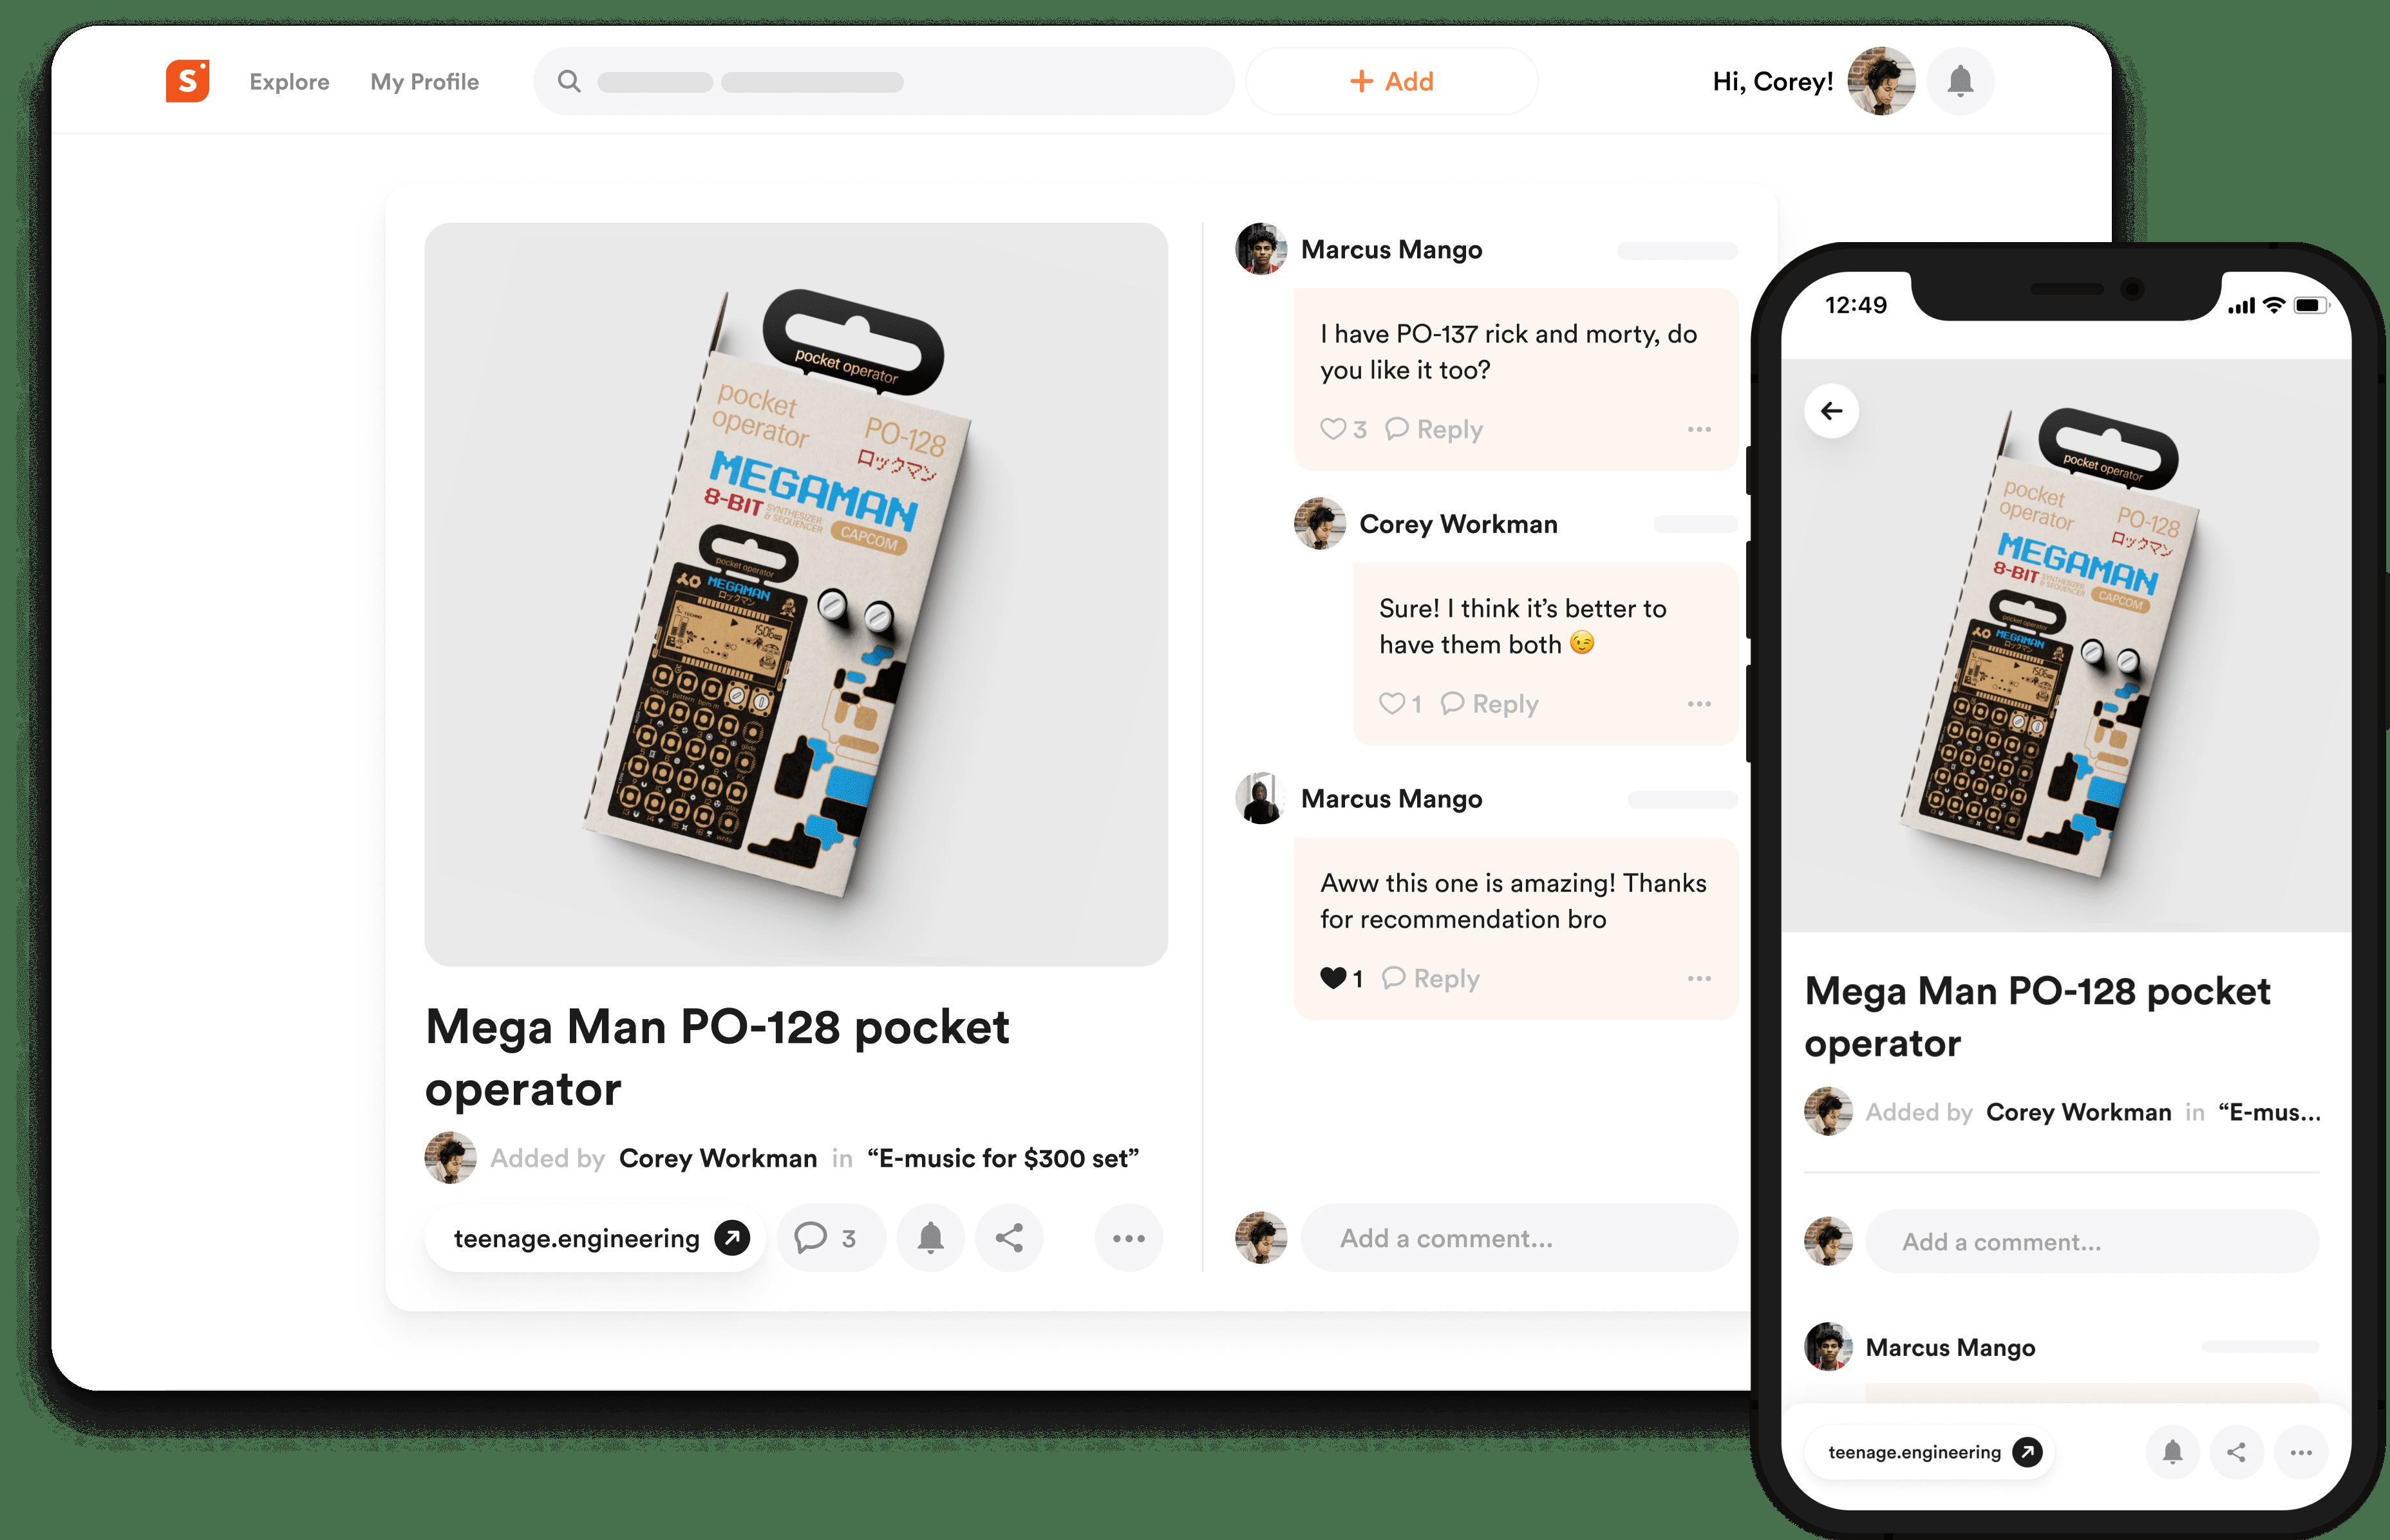 shopper.com product card image on desktop and on mobile